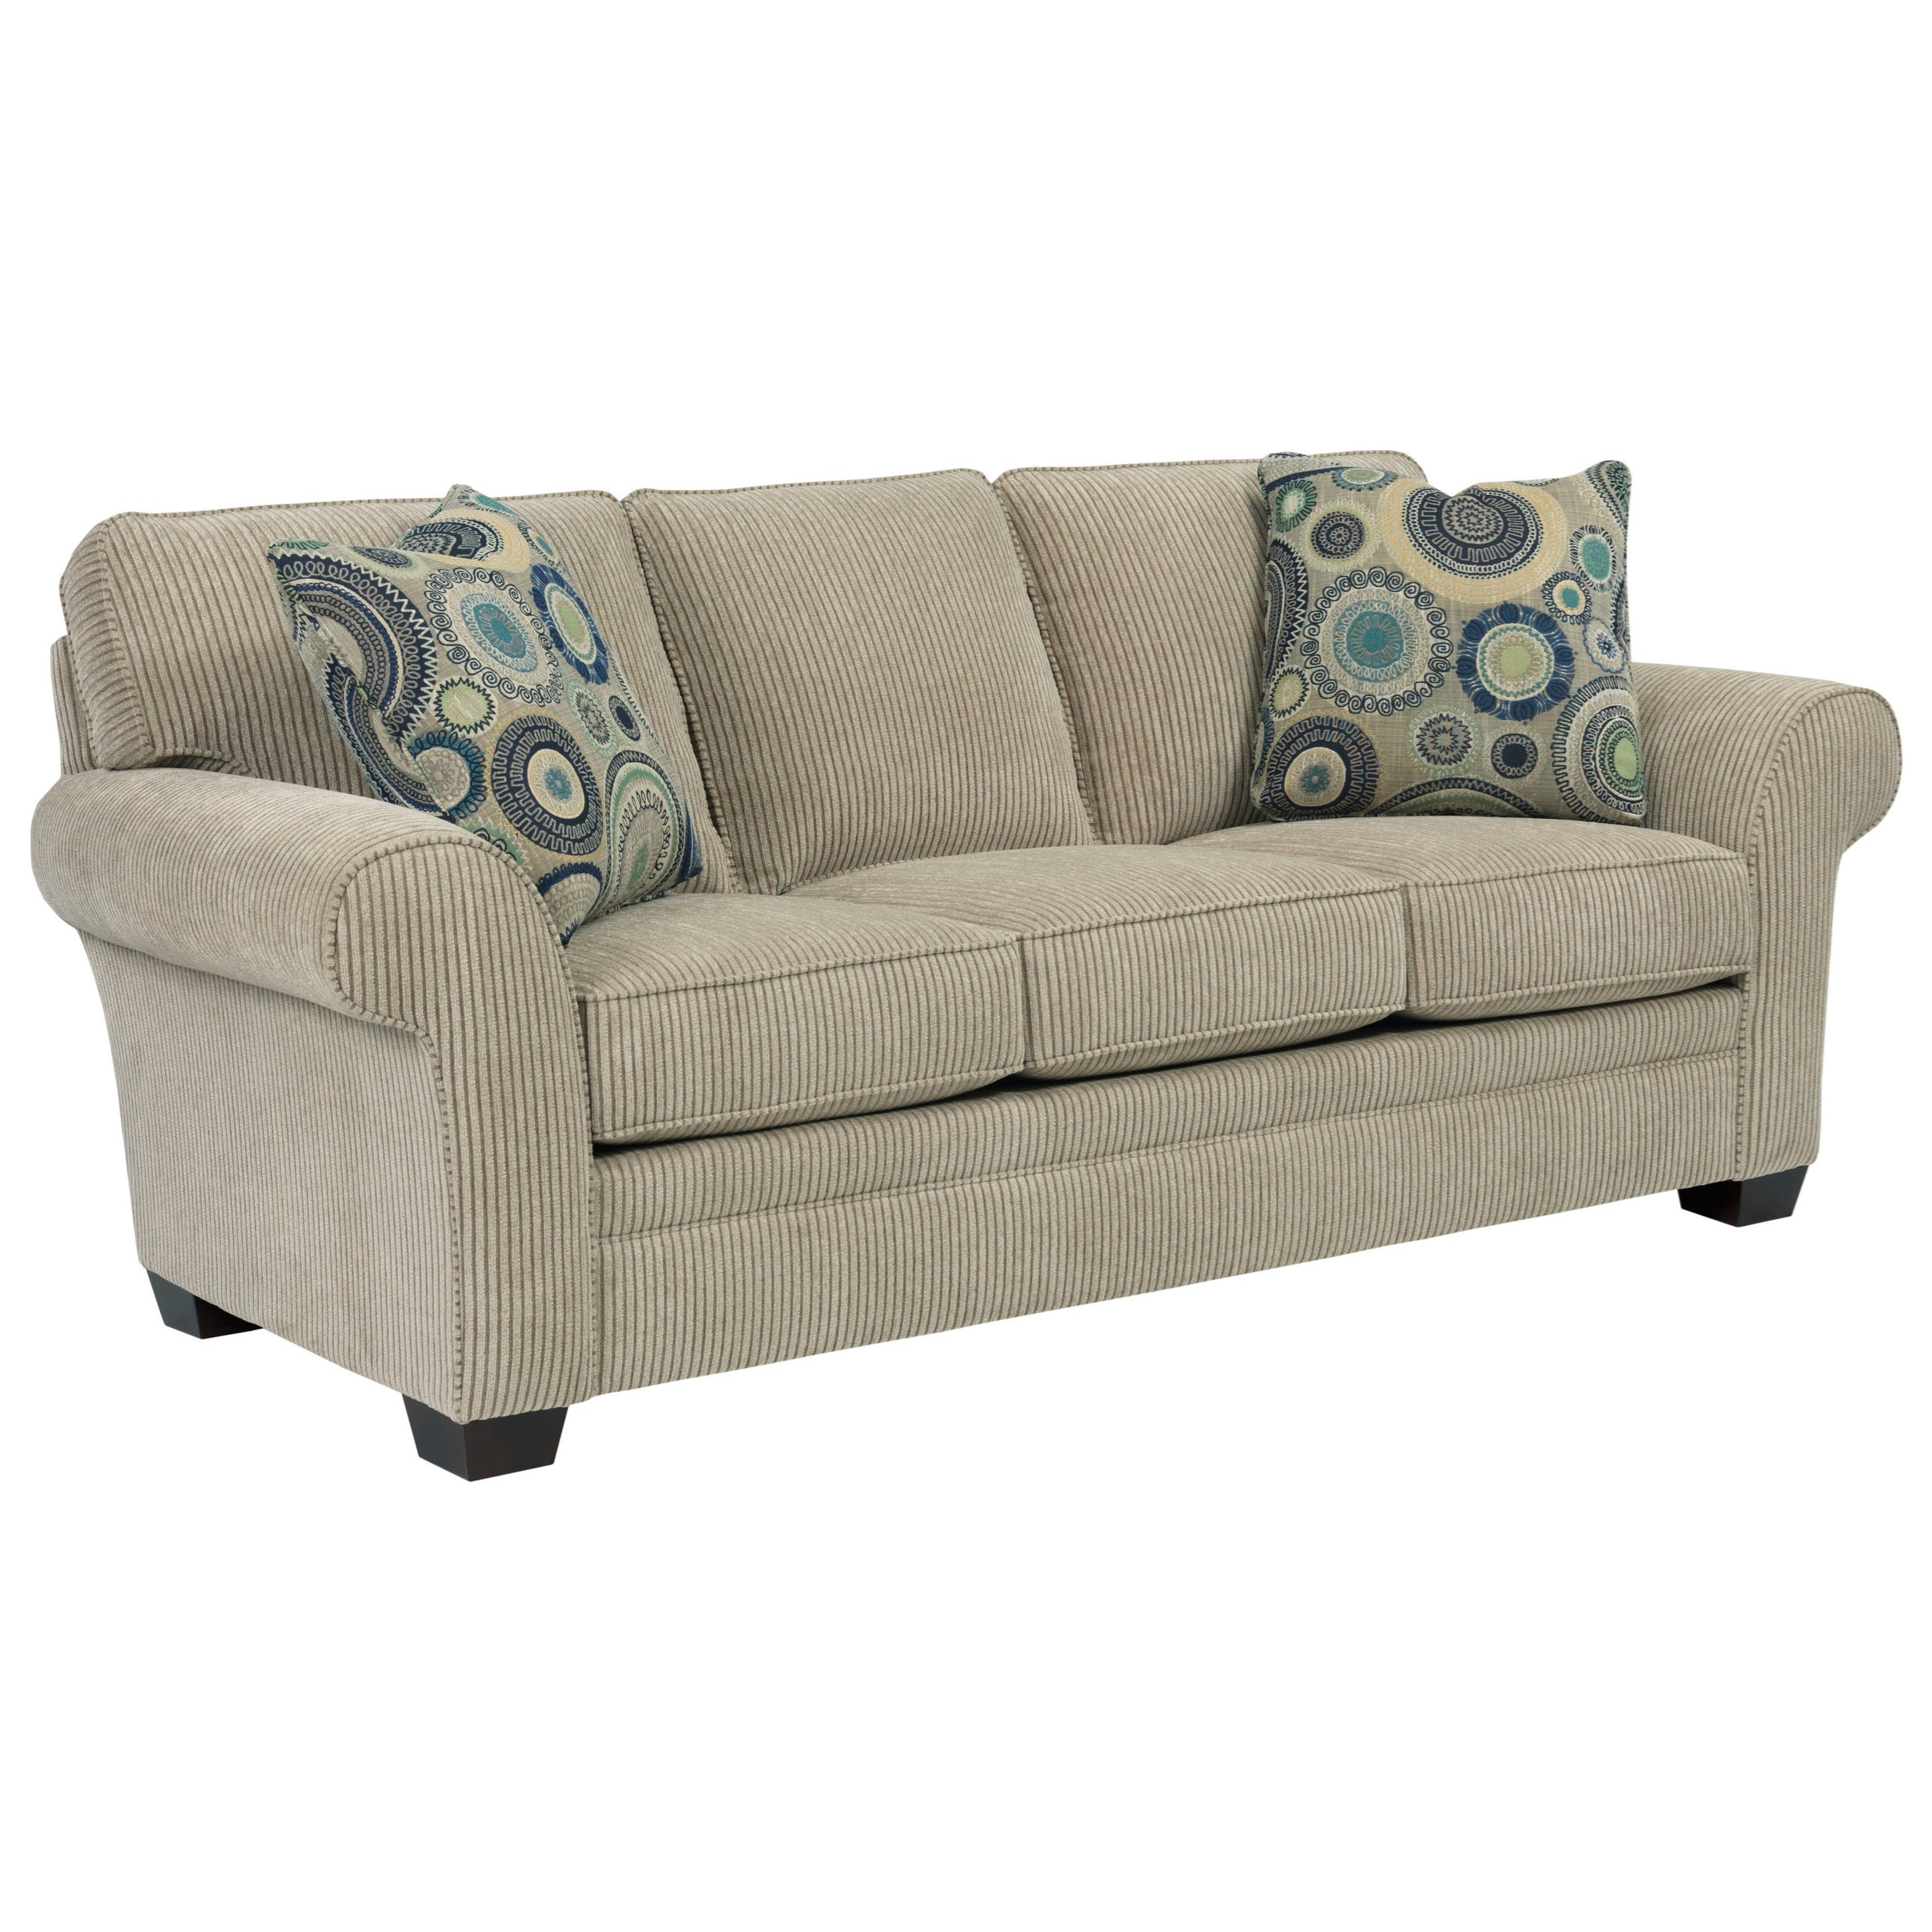 Broyhill Furniture Zachary Queen Air Dream Sleeper - Item Number: 7902-7A-8785-93